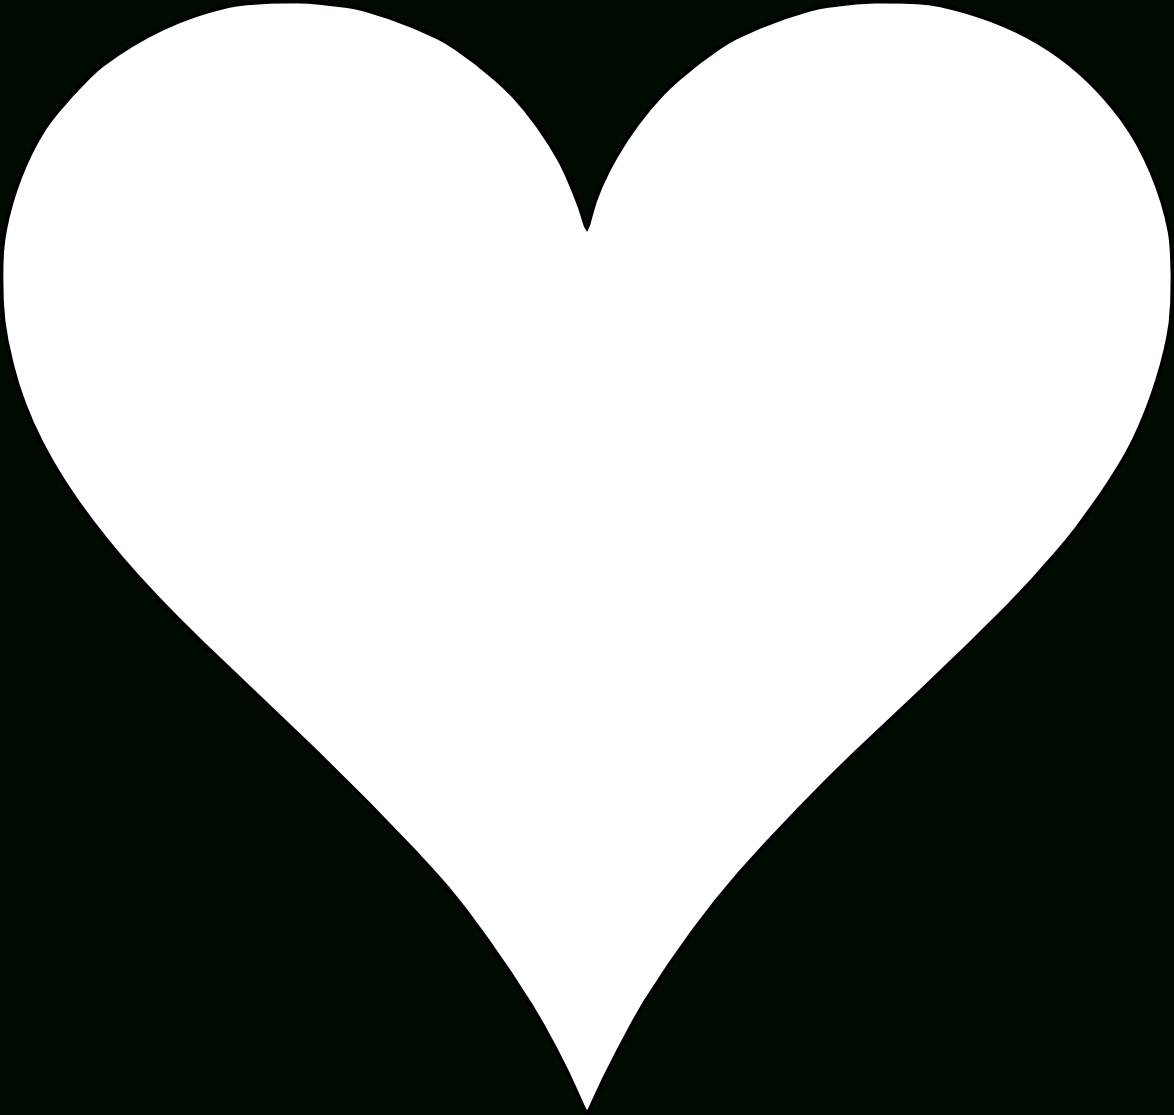 6 Free Printable Heart Templates | Hearts | Printable Heart Template - Free Printable Hearts